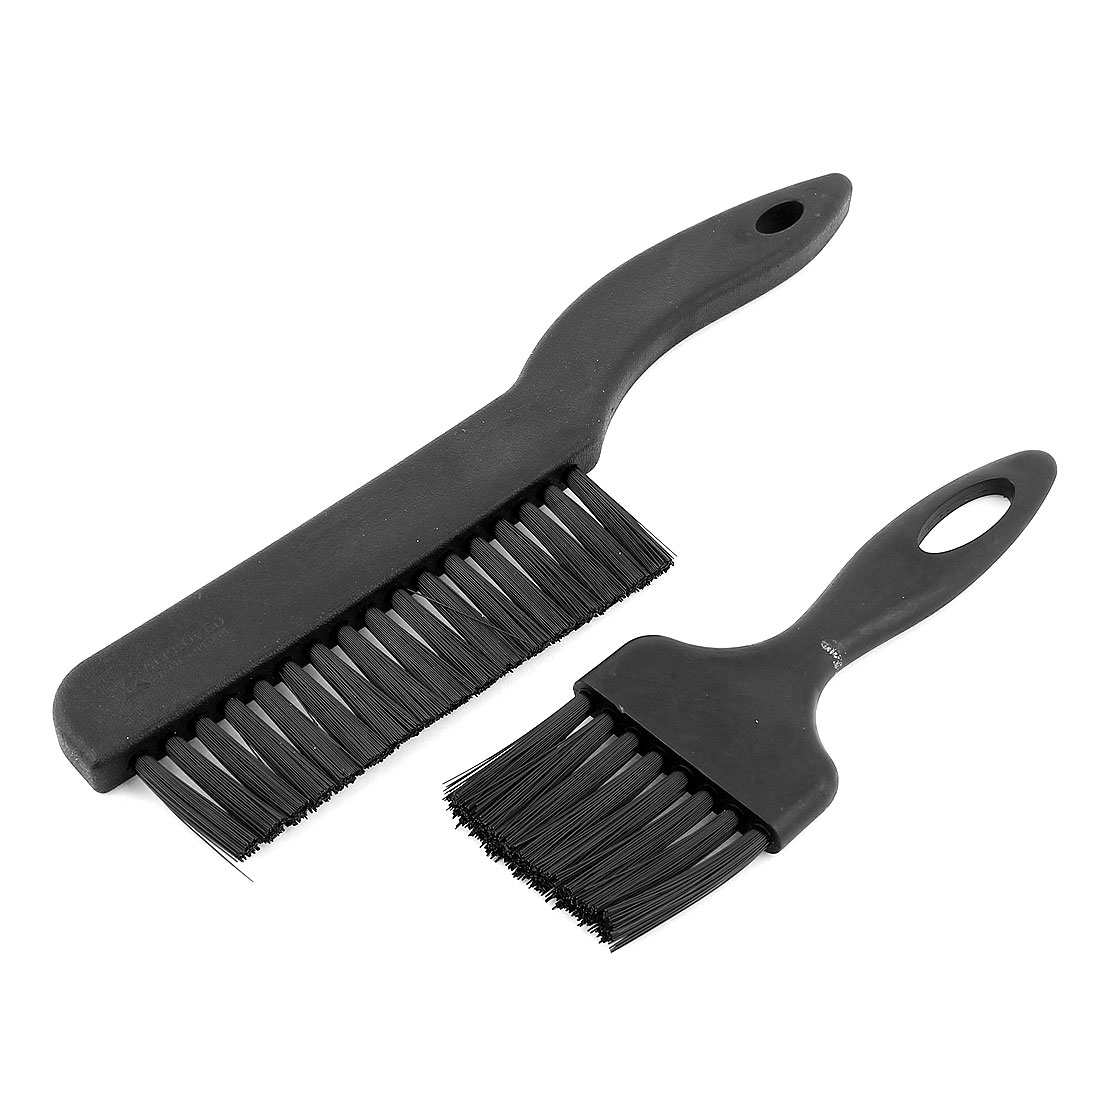 2 Pcs Black Plastic Handle Conductive Ground Motherboard ESD Anti Static Brush Comb Set